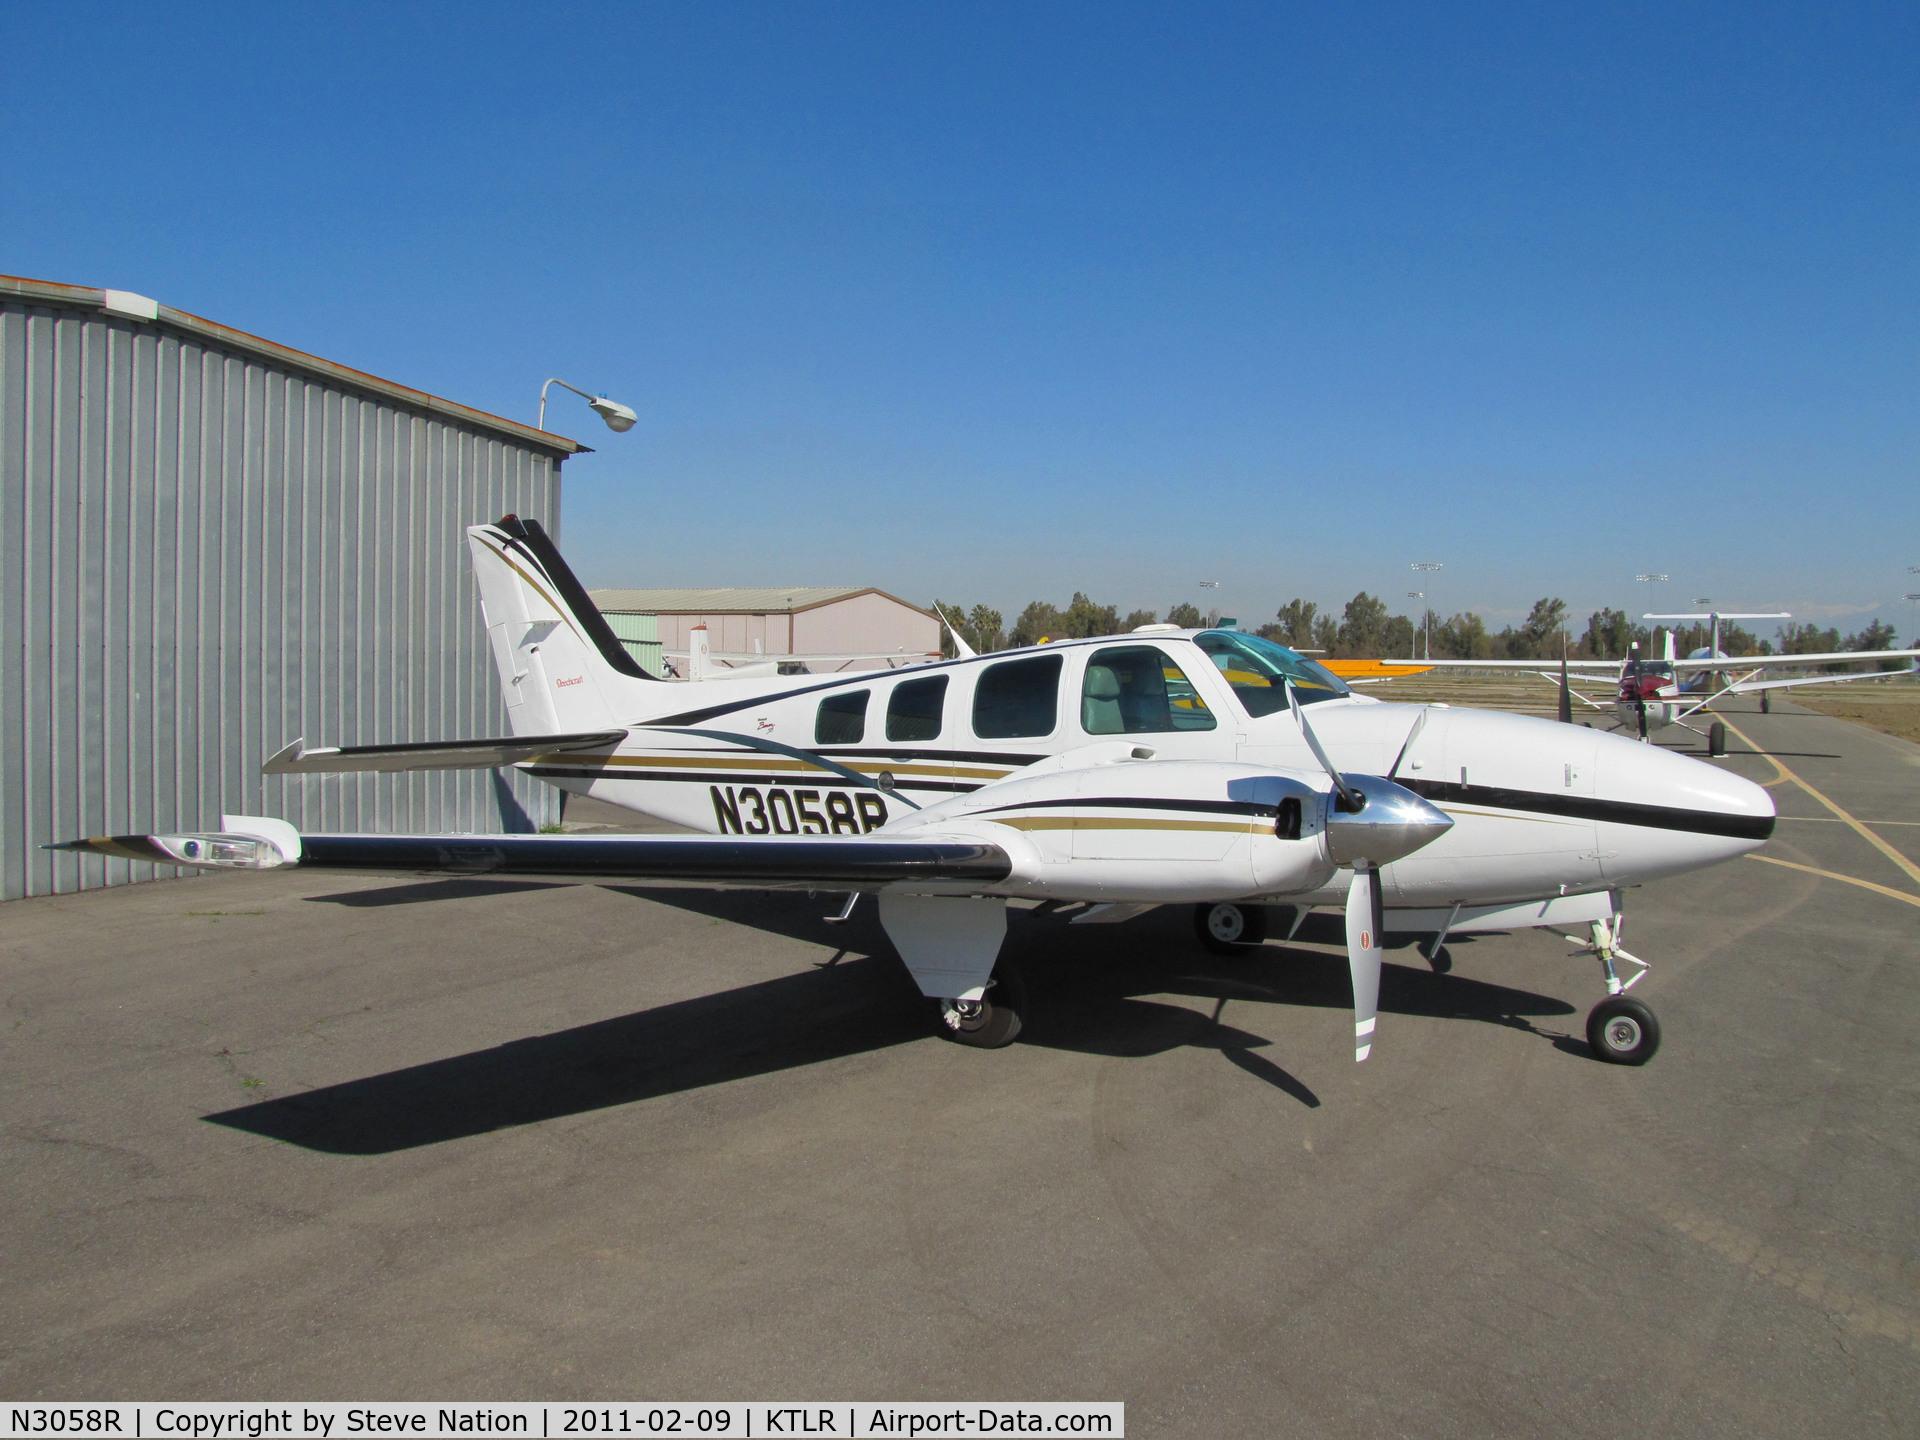 N3058R, 1998 Raytheon Aircraft Company 58 C/N TH-1870, On Top Aviation LLC (Salinas, CA) 1998 Raytheon Beechcraft 58 Baron photographed @ Tulare, CA